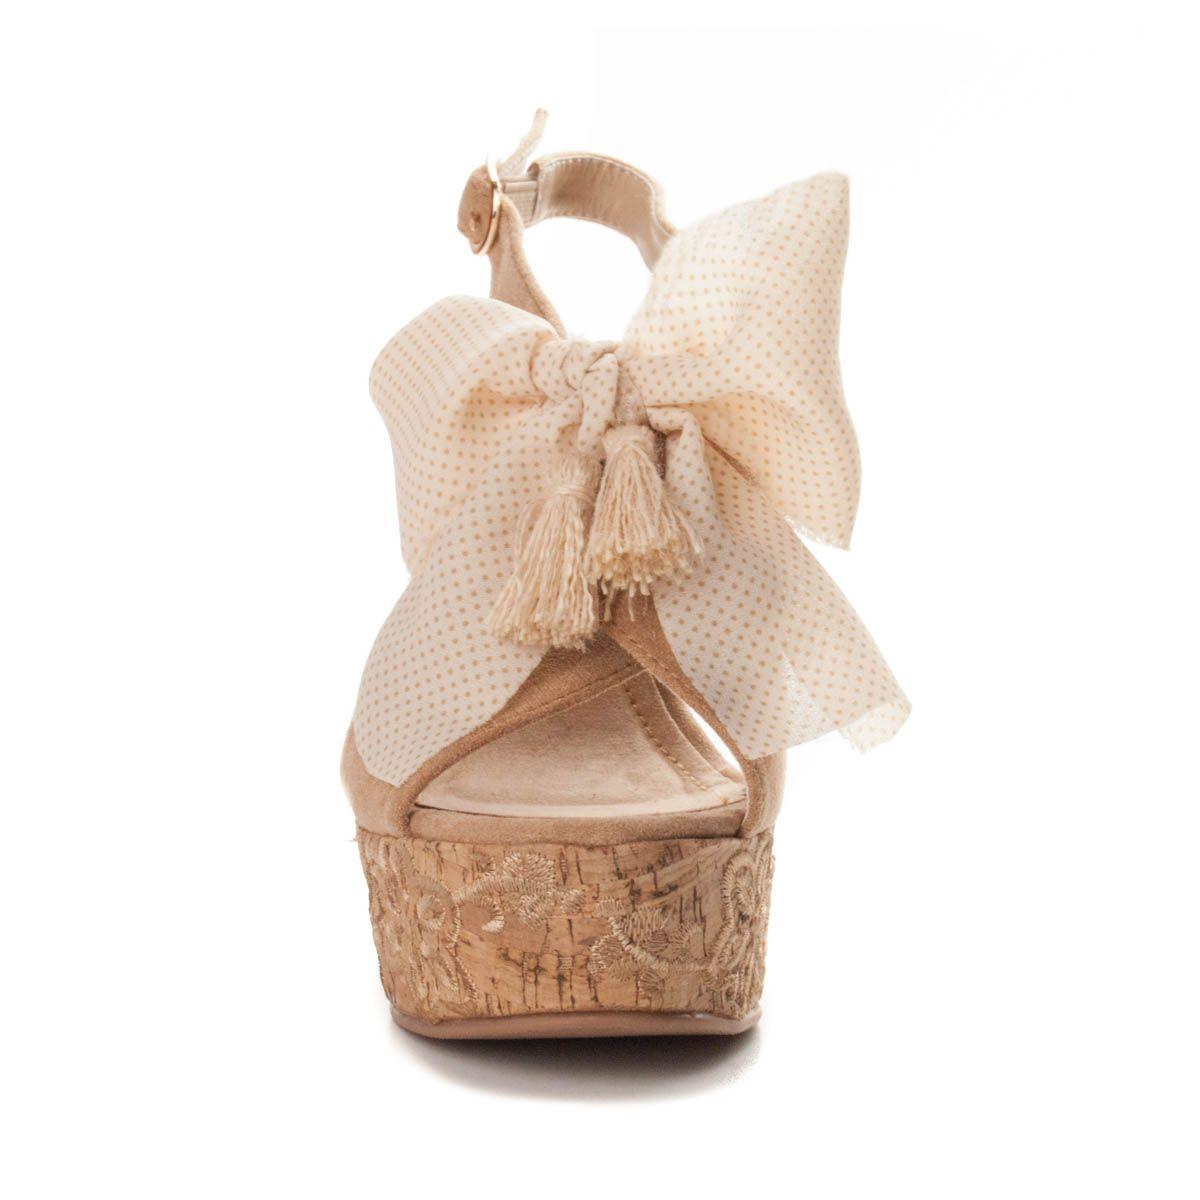 Maria Graor Wedge Sandal in Beige